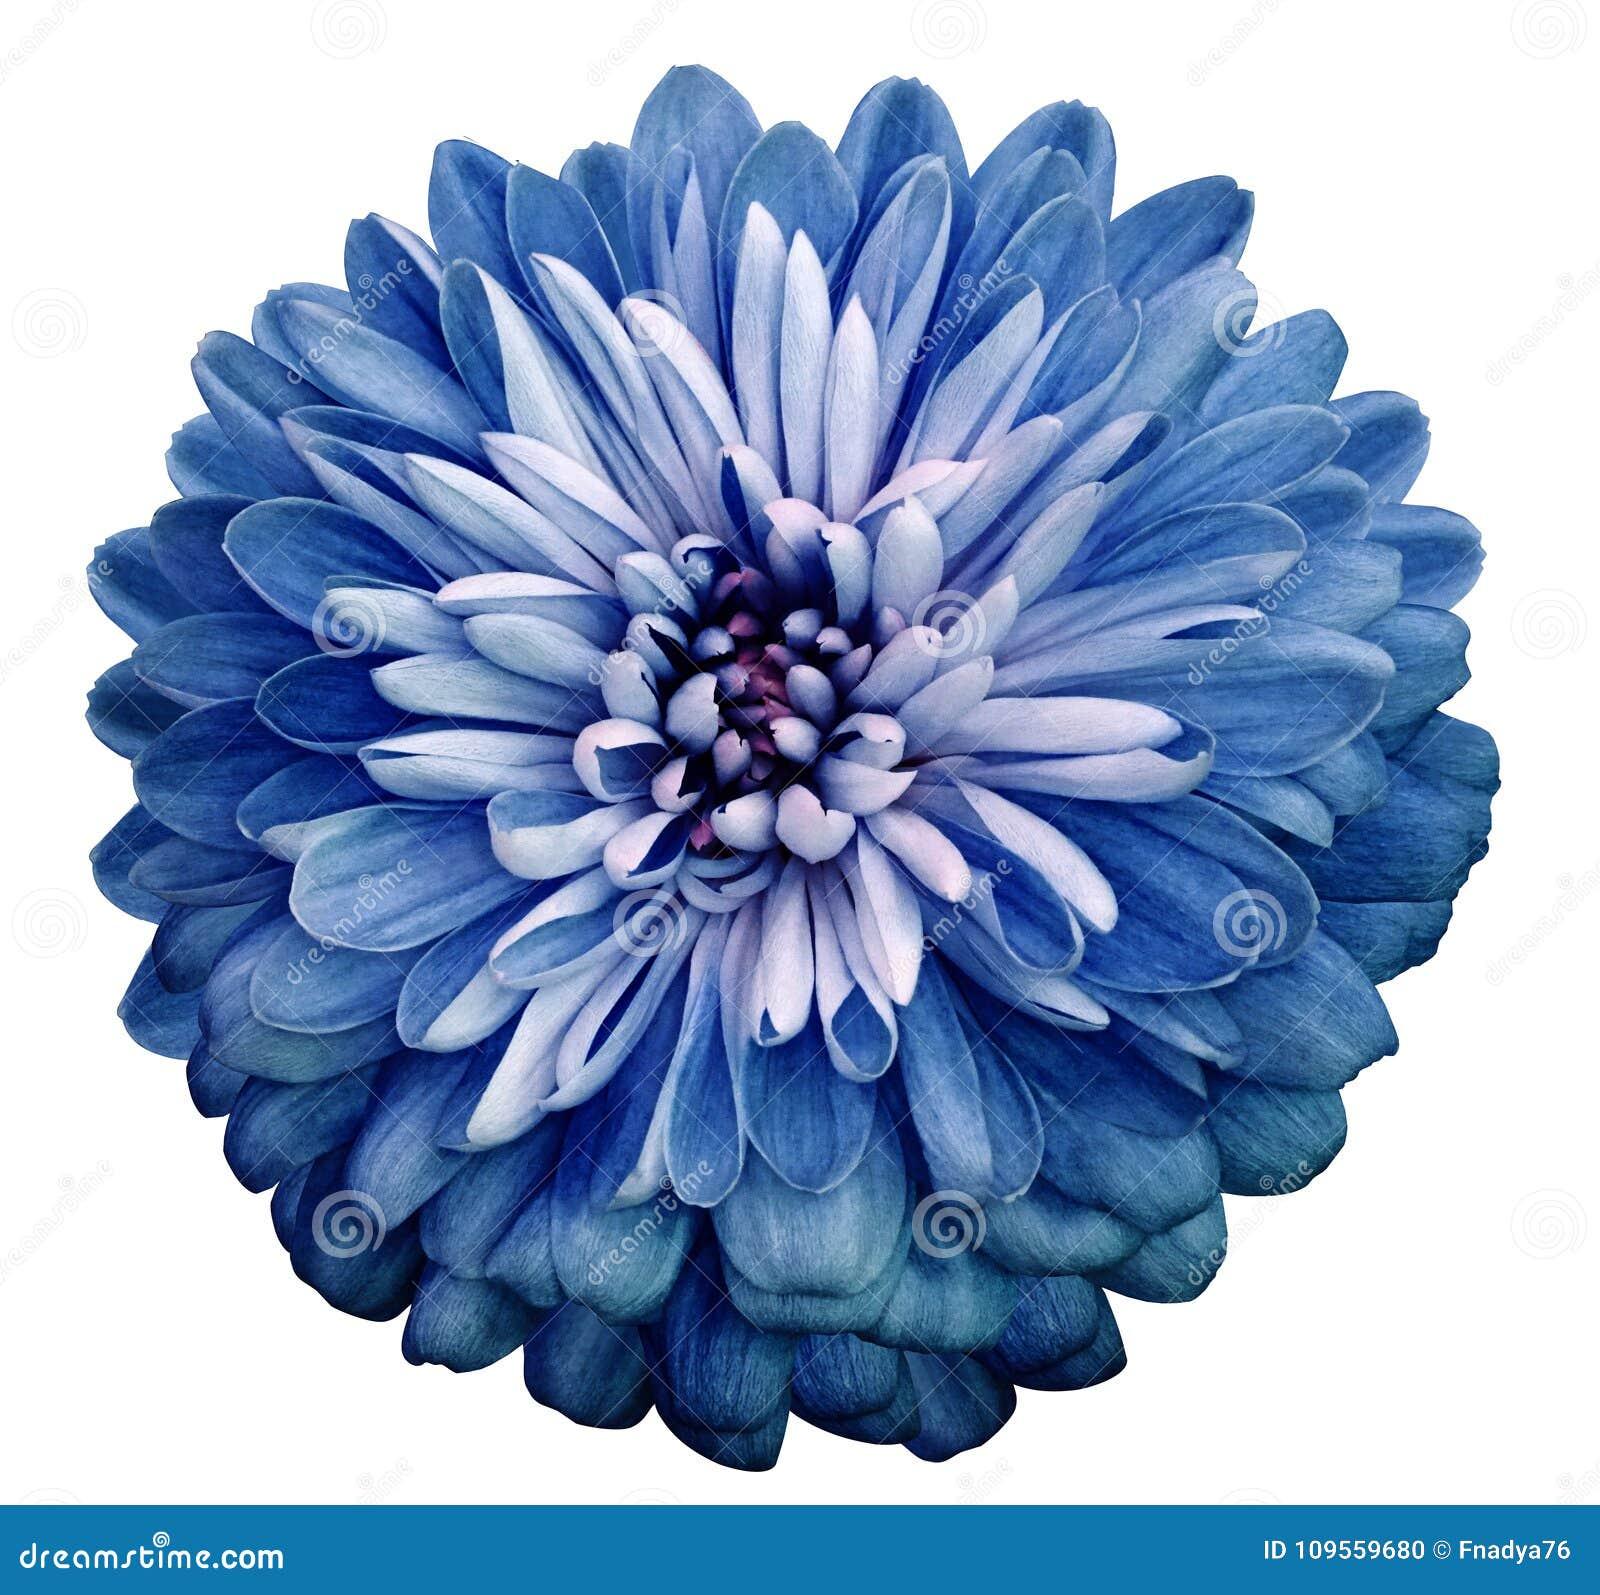 Purple Flower Clipart No Background: Imagens De Stock Crisântemo Branco